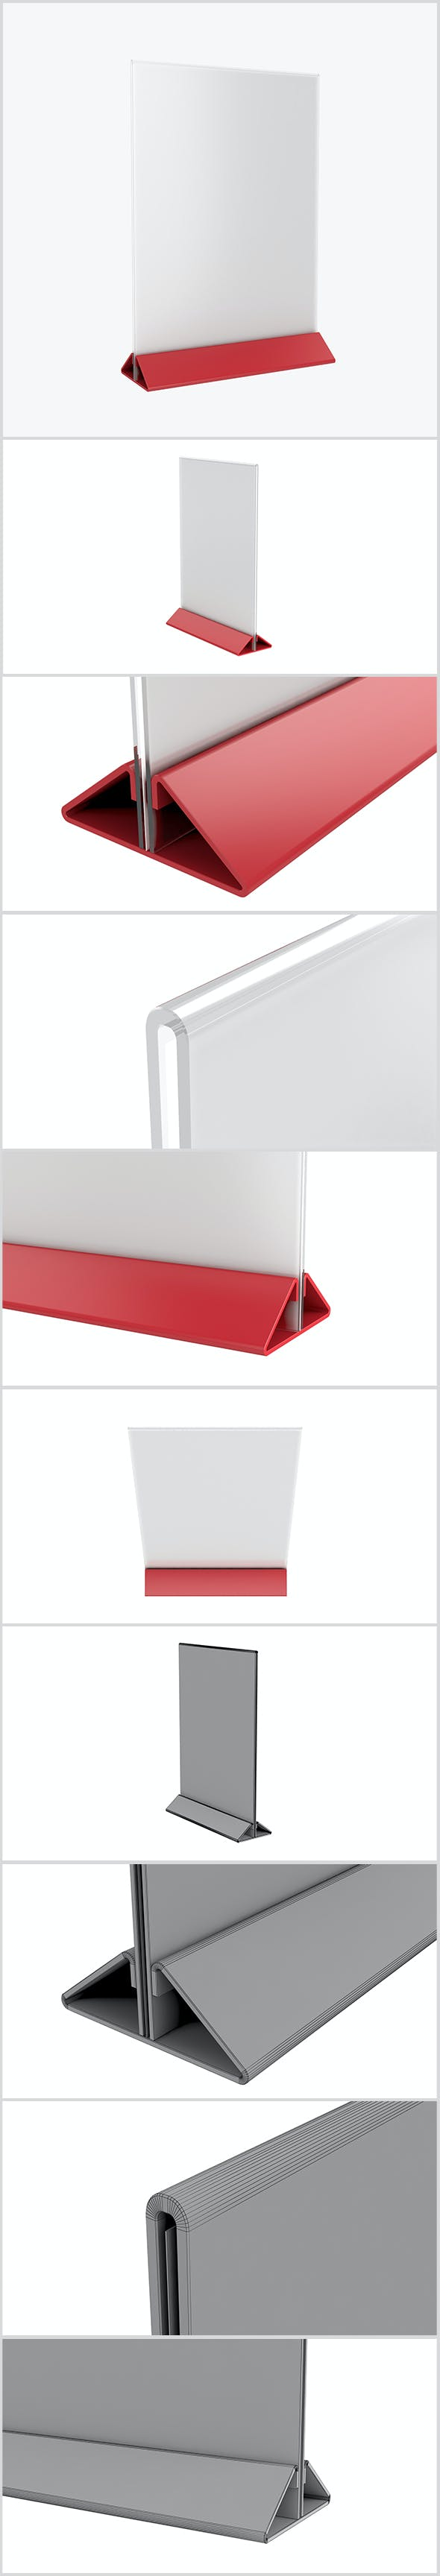 Plastic Holder - 3DOcean Item for Sale